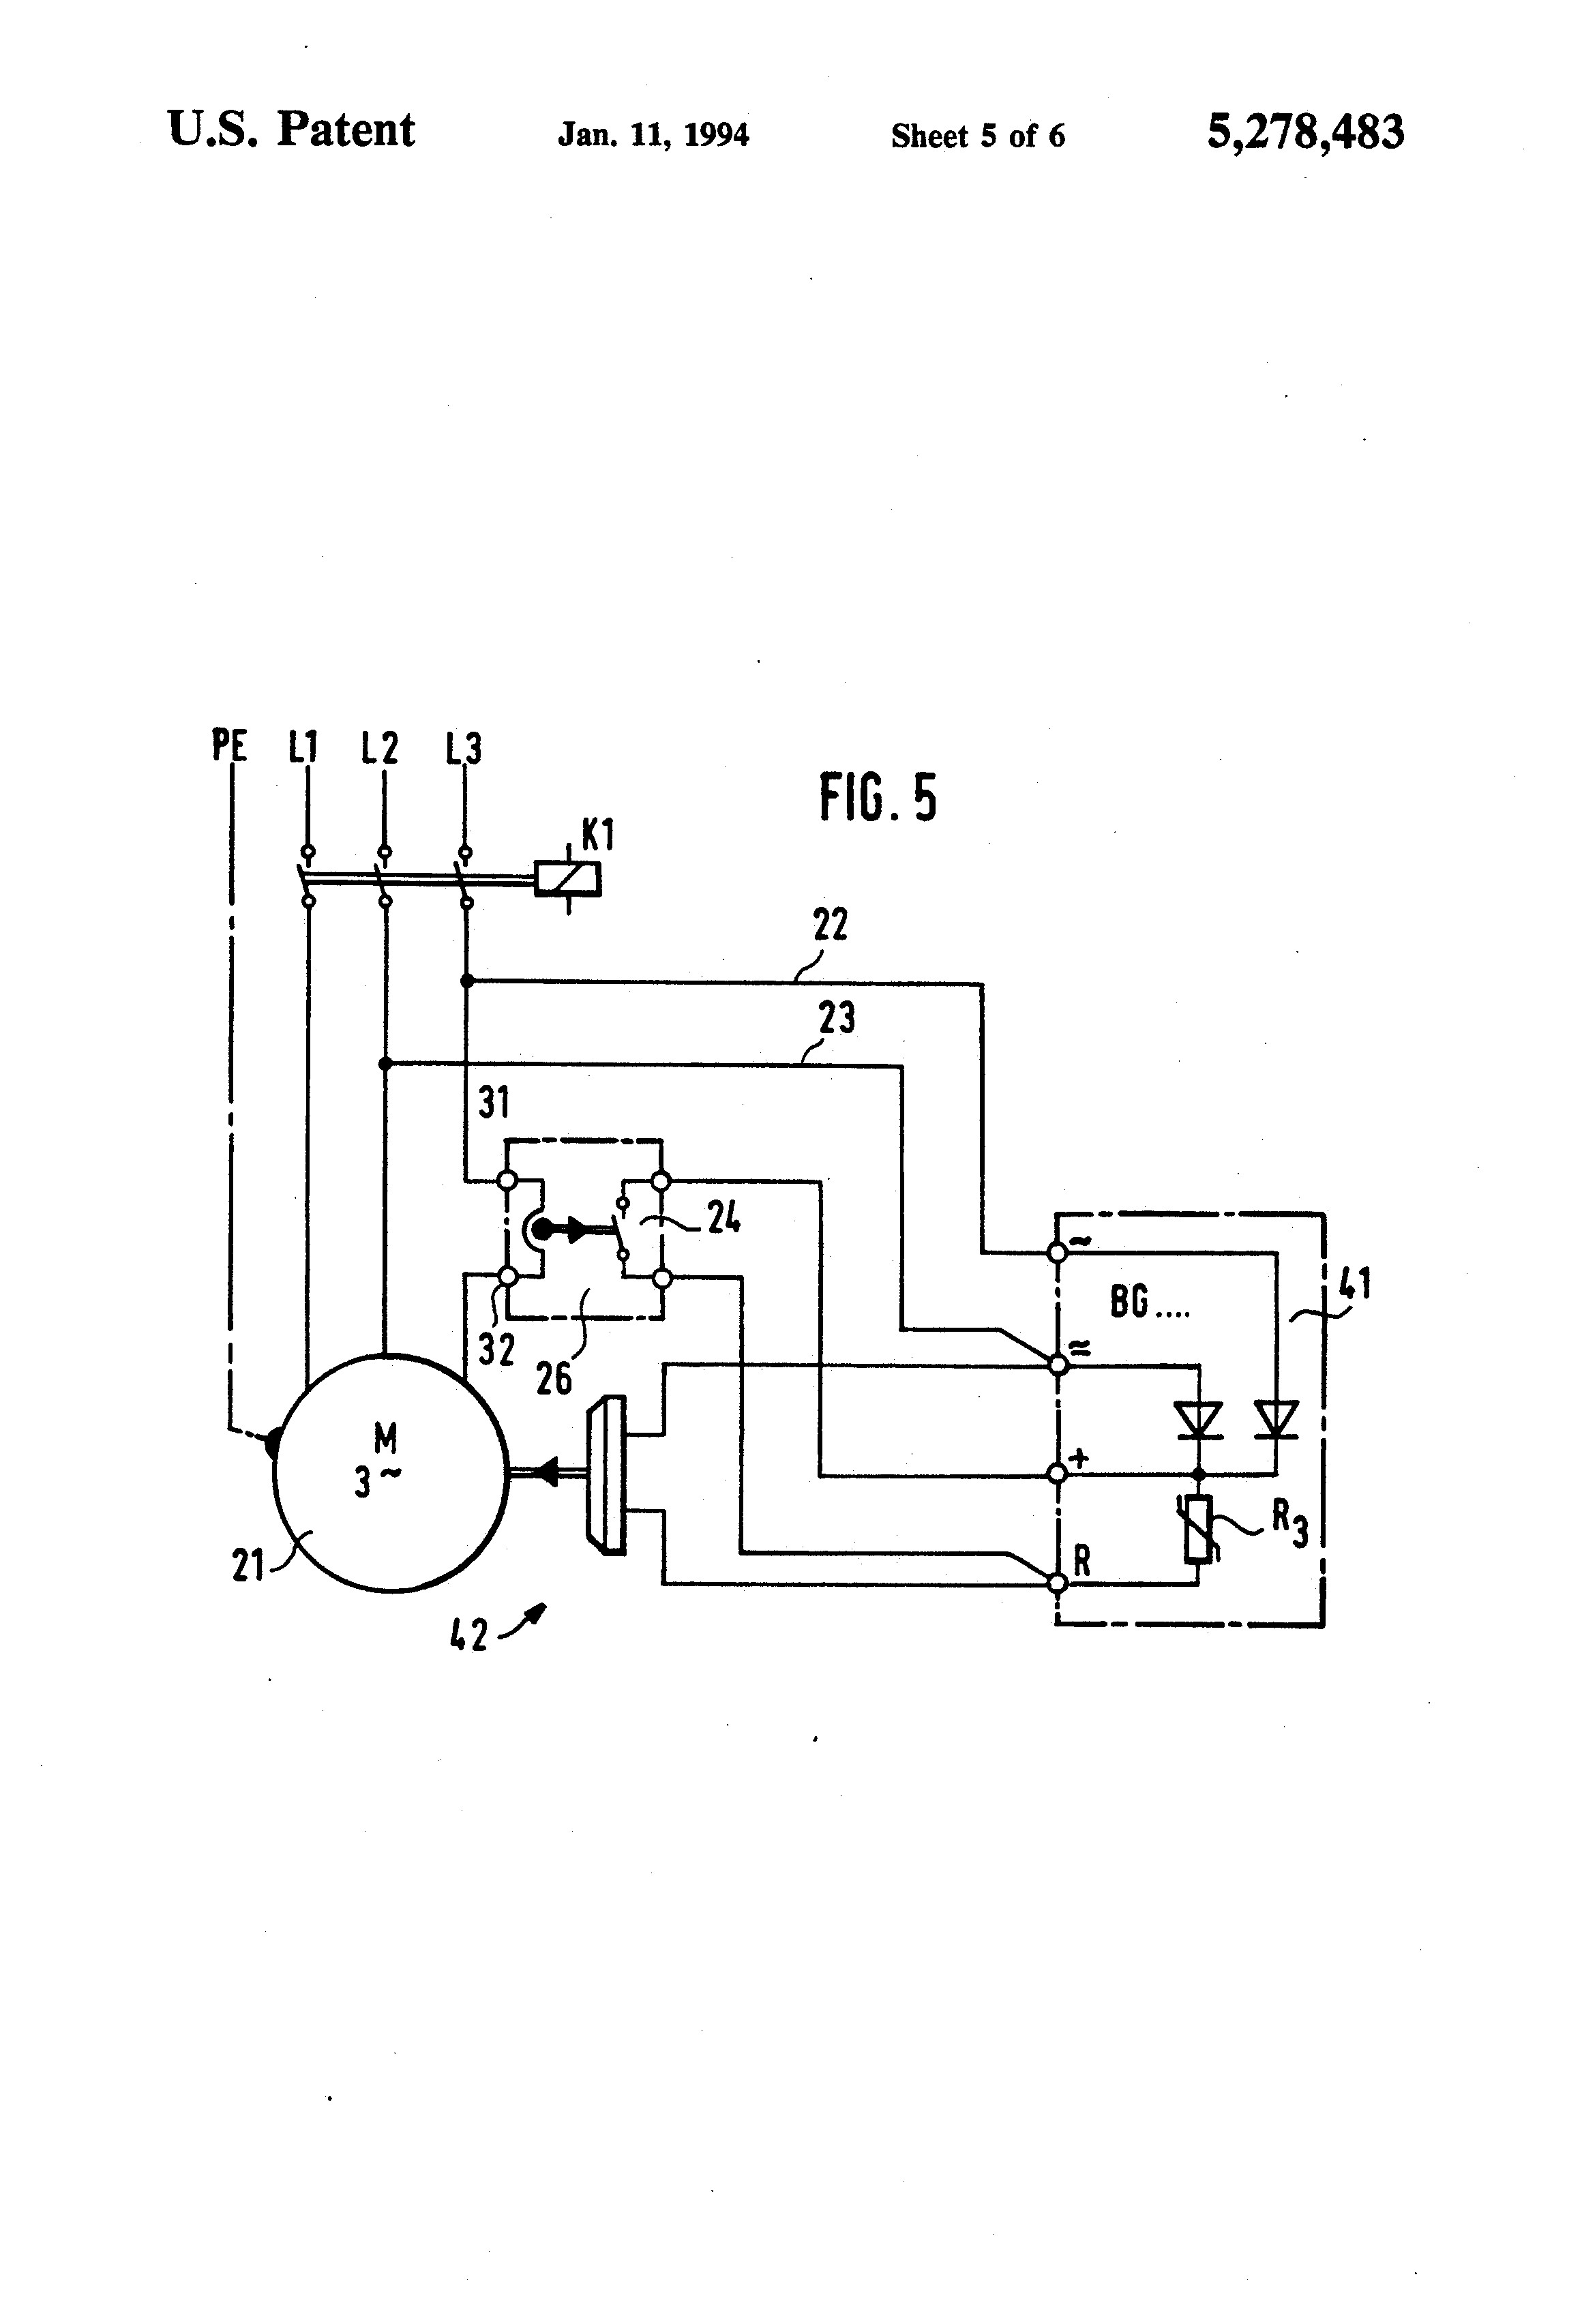 sew eurodrive 6 lead motor wiring diagram motorssite org rh motorssite org sew eurodrive motor brake wiring diagram sew eurodrive drn motor wiring diagram